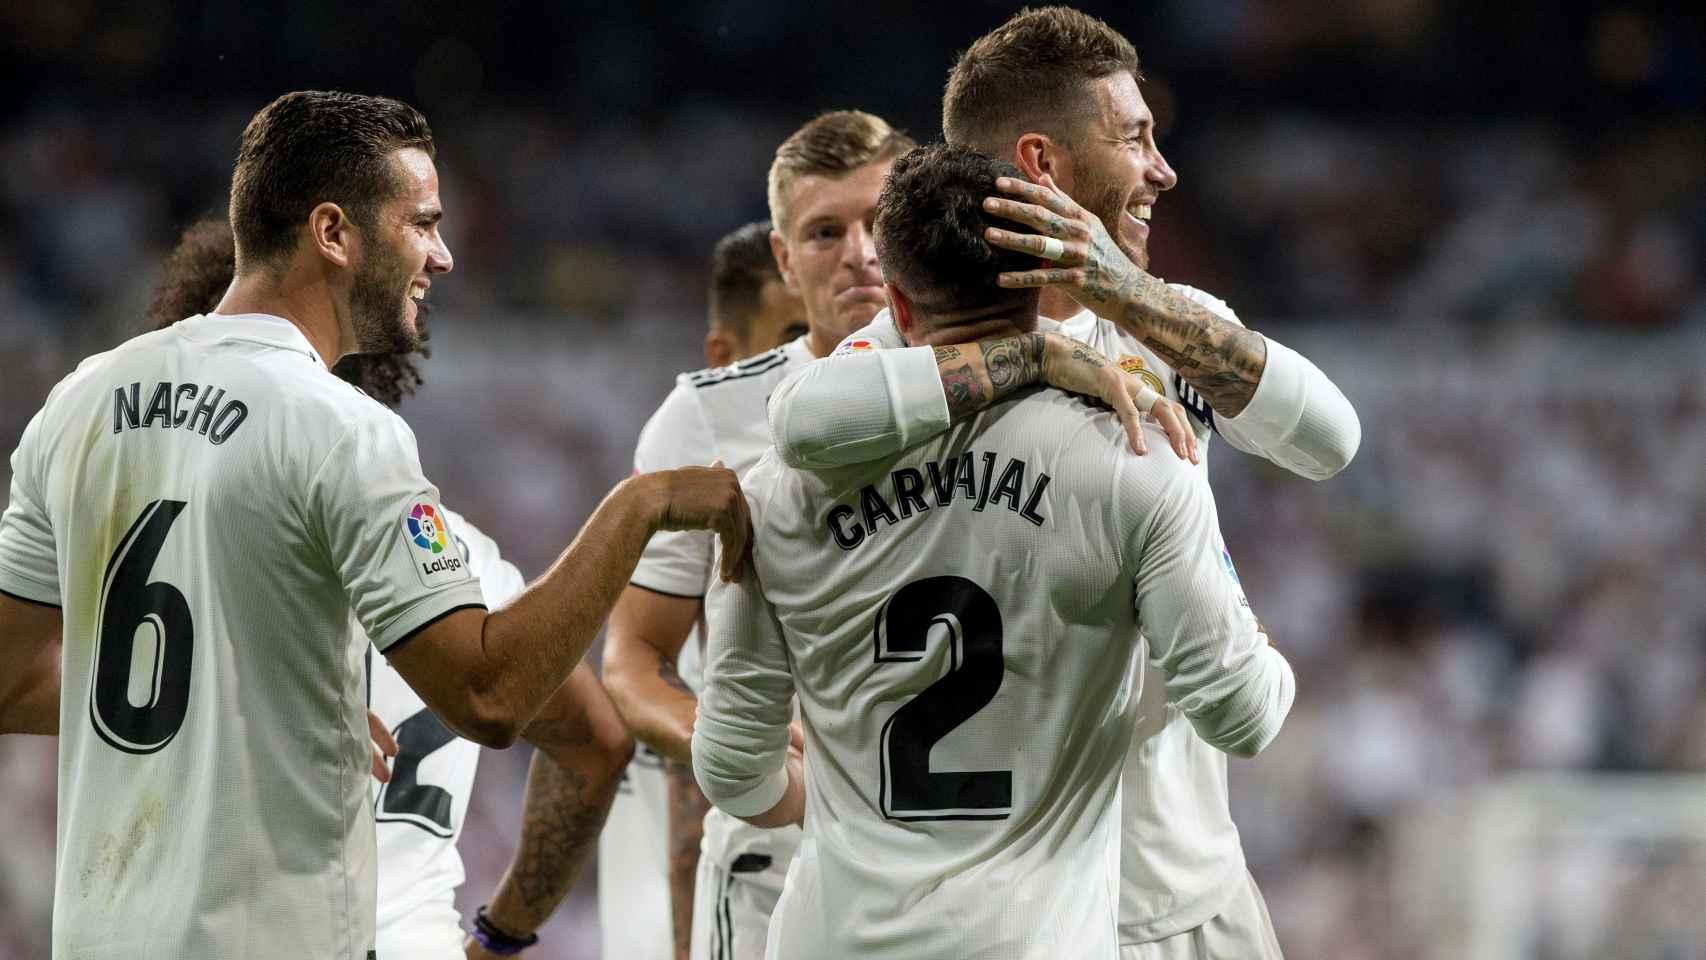 Sergio Ramos abraza a Carvajal tras su gol